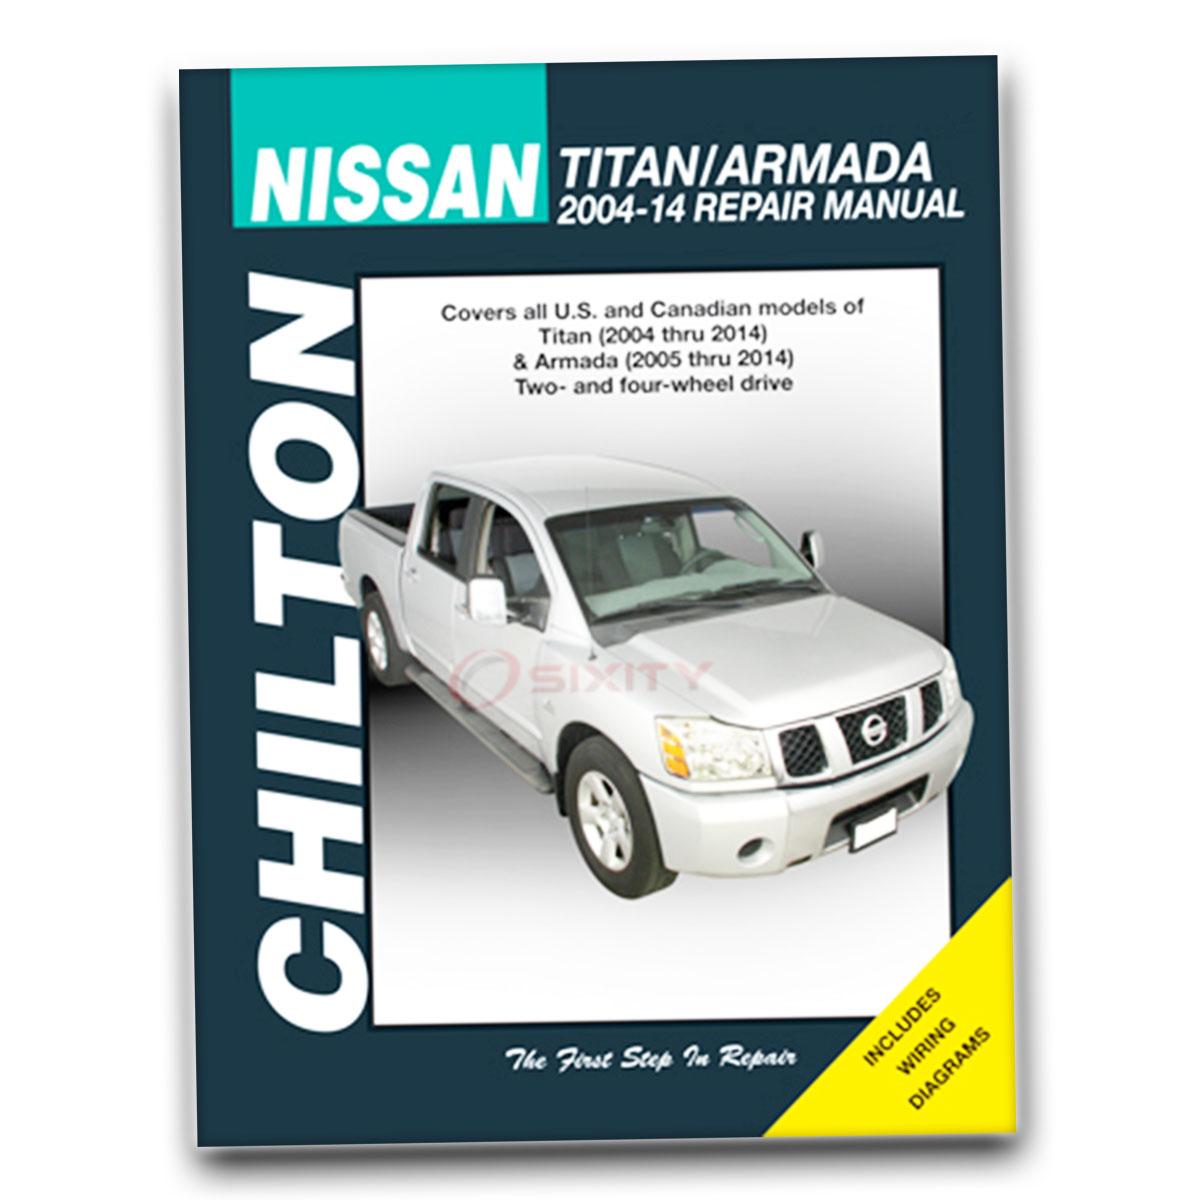 Nissan Titan Chilton Repair Manual Le Pro 4x Se Xe Shop Service 2004 Armada Wiring Diagrams Garage Book Yx